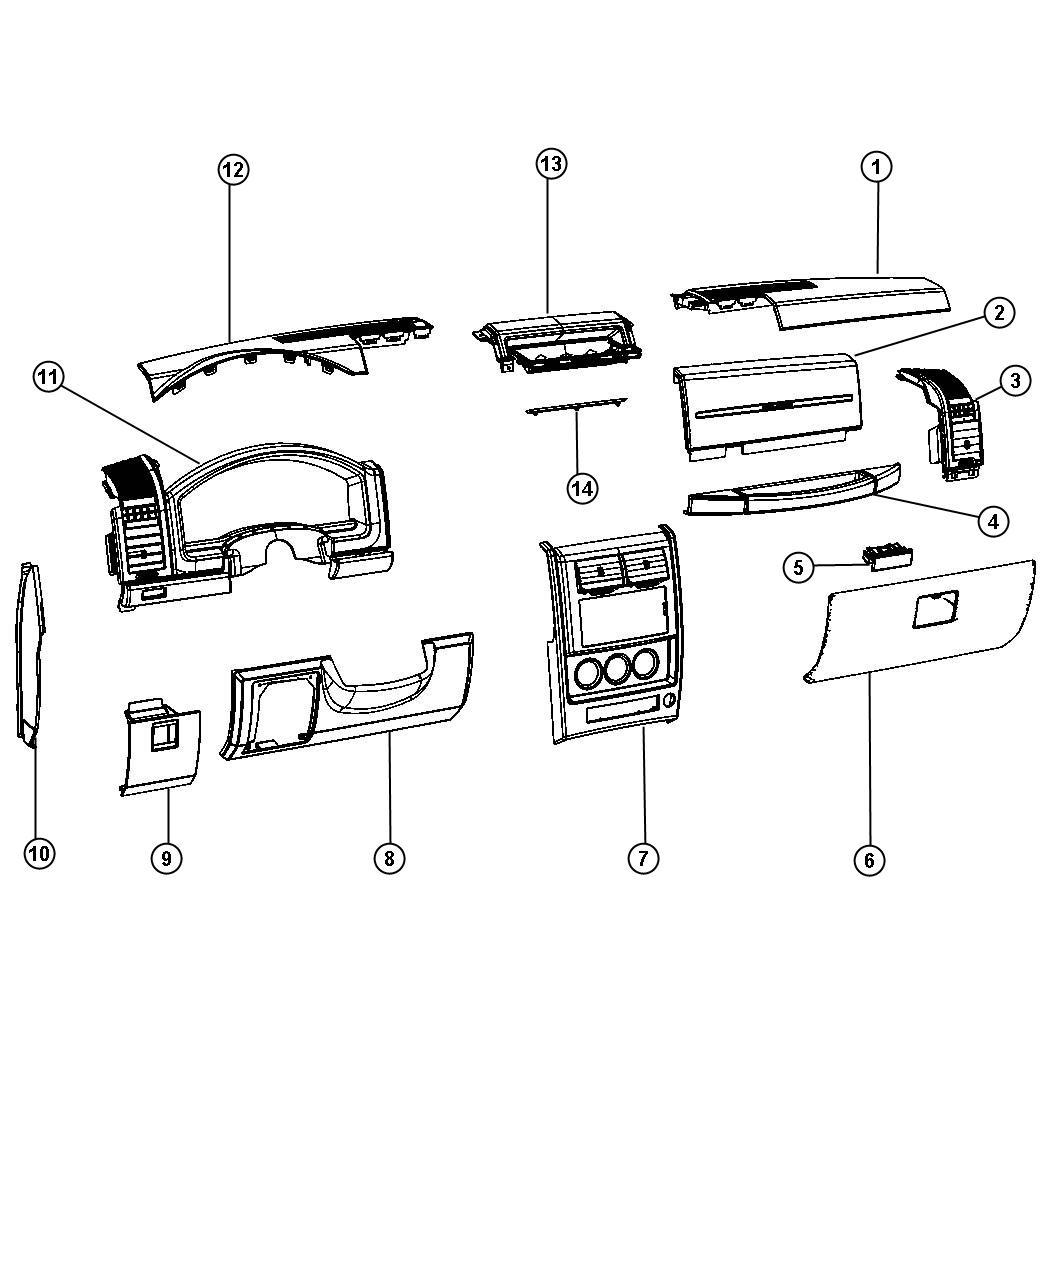 Jeep Liberty Handle. Grab. [dv]. Trim: [all trim codes